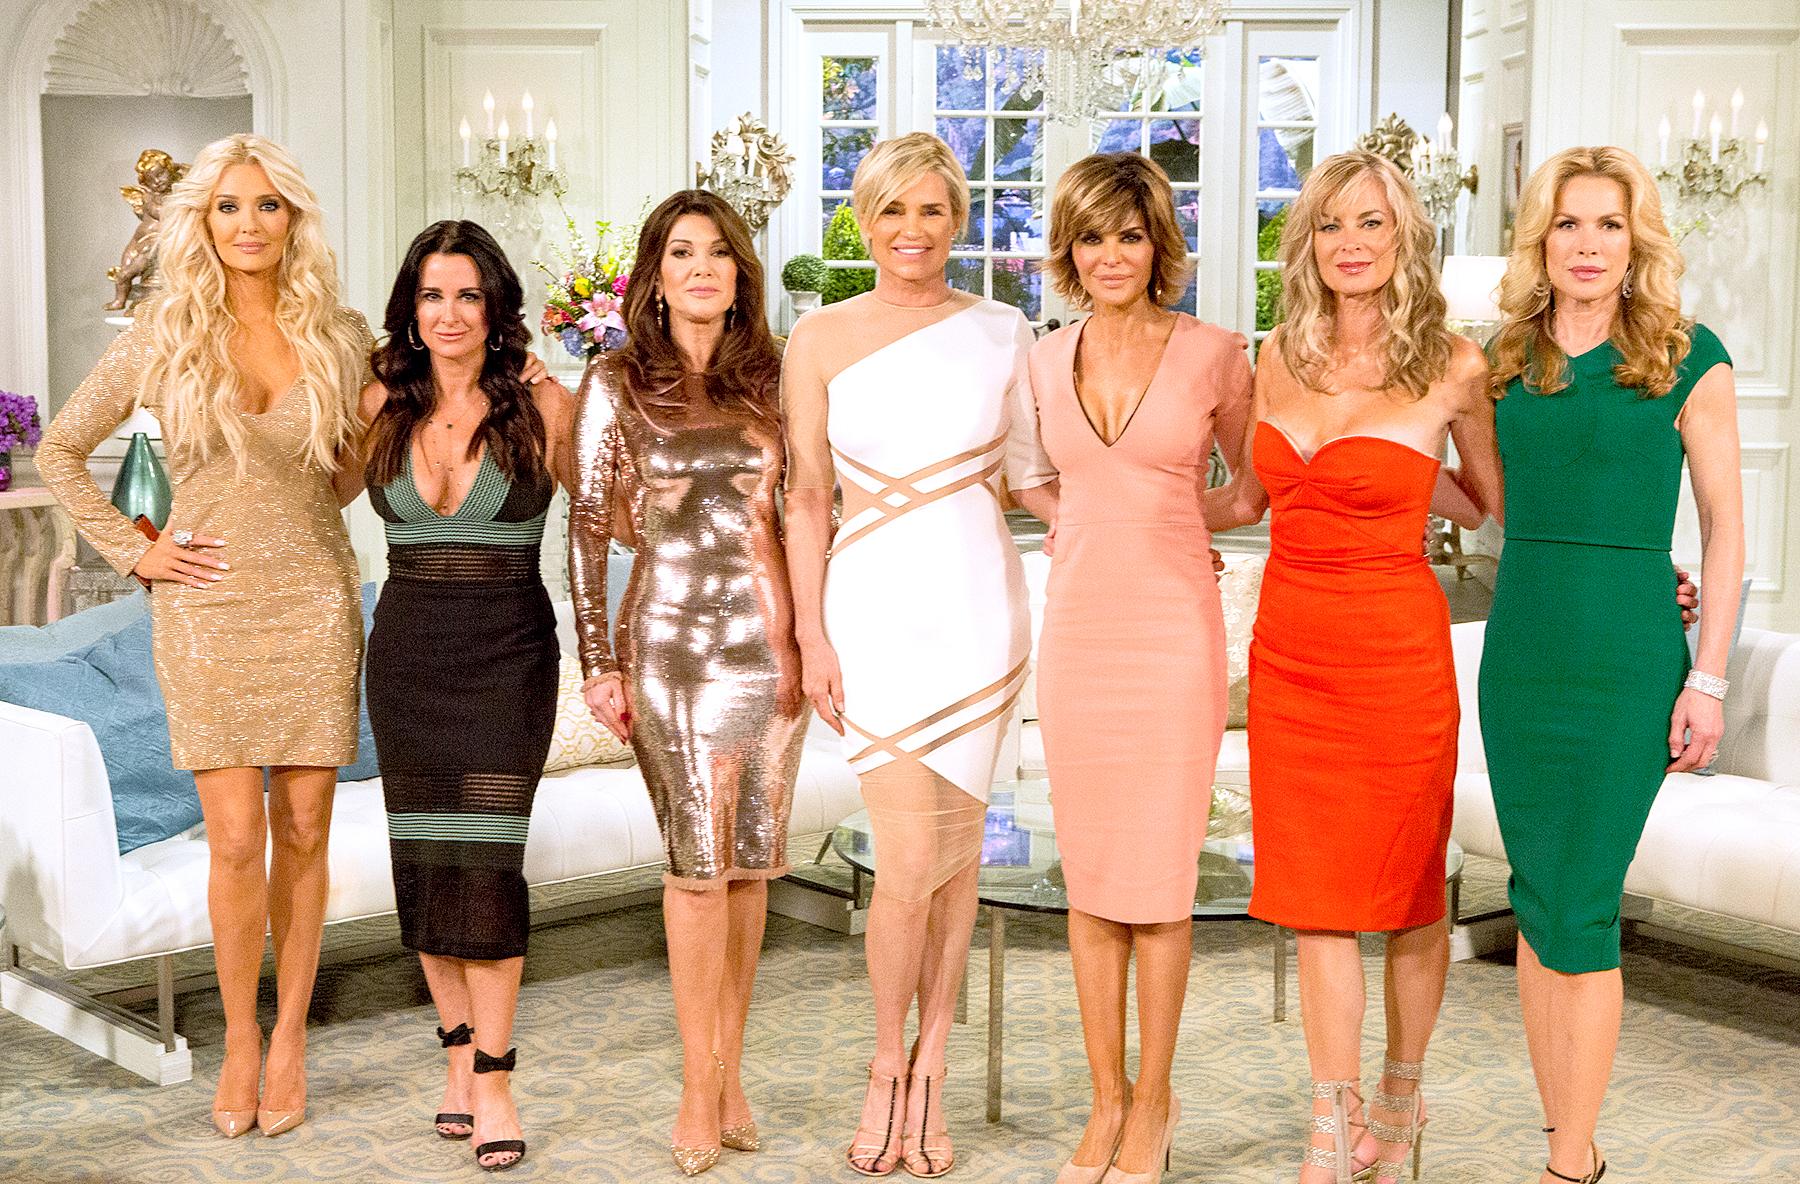 Erika Girardi, Kyle Richards, Lisa Vanderpump, Yolanda H. Foster, Lisa Rinna, Eileen Davidson, and Kathryn Edwards at the The Real Housewives Of Beverly Hills Reunion.